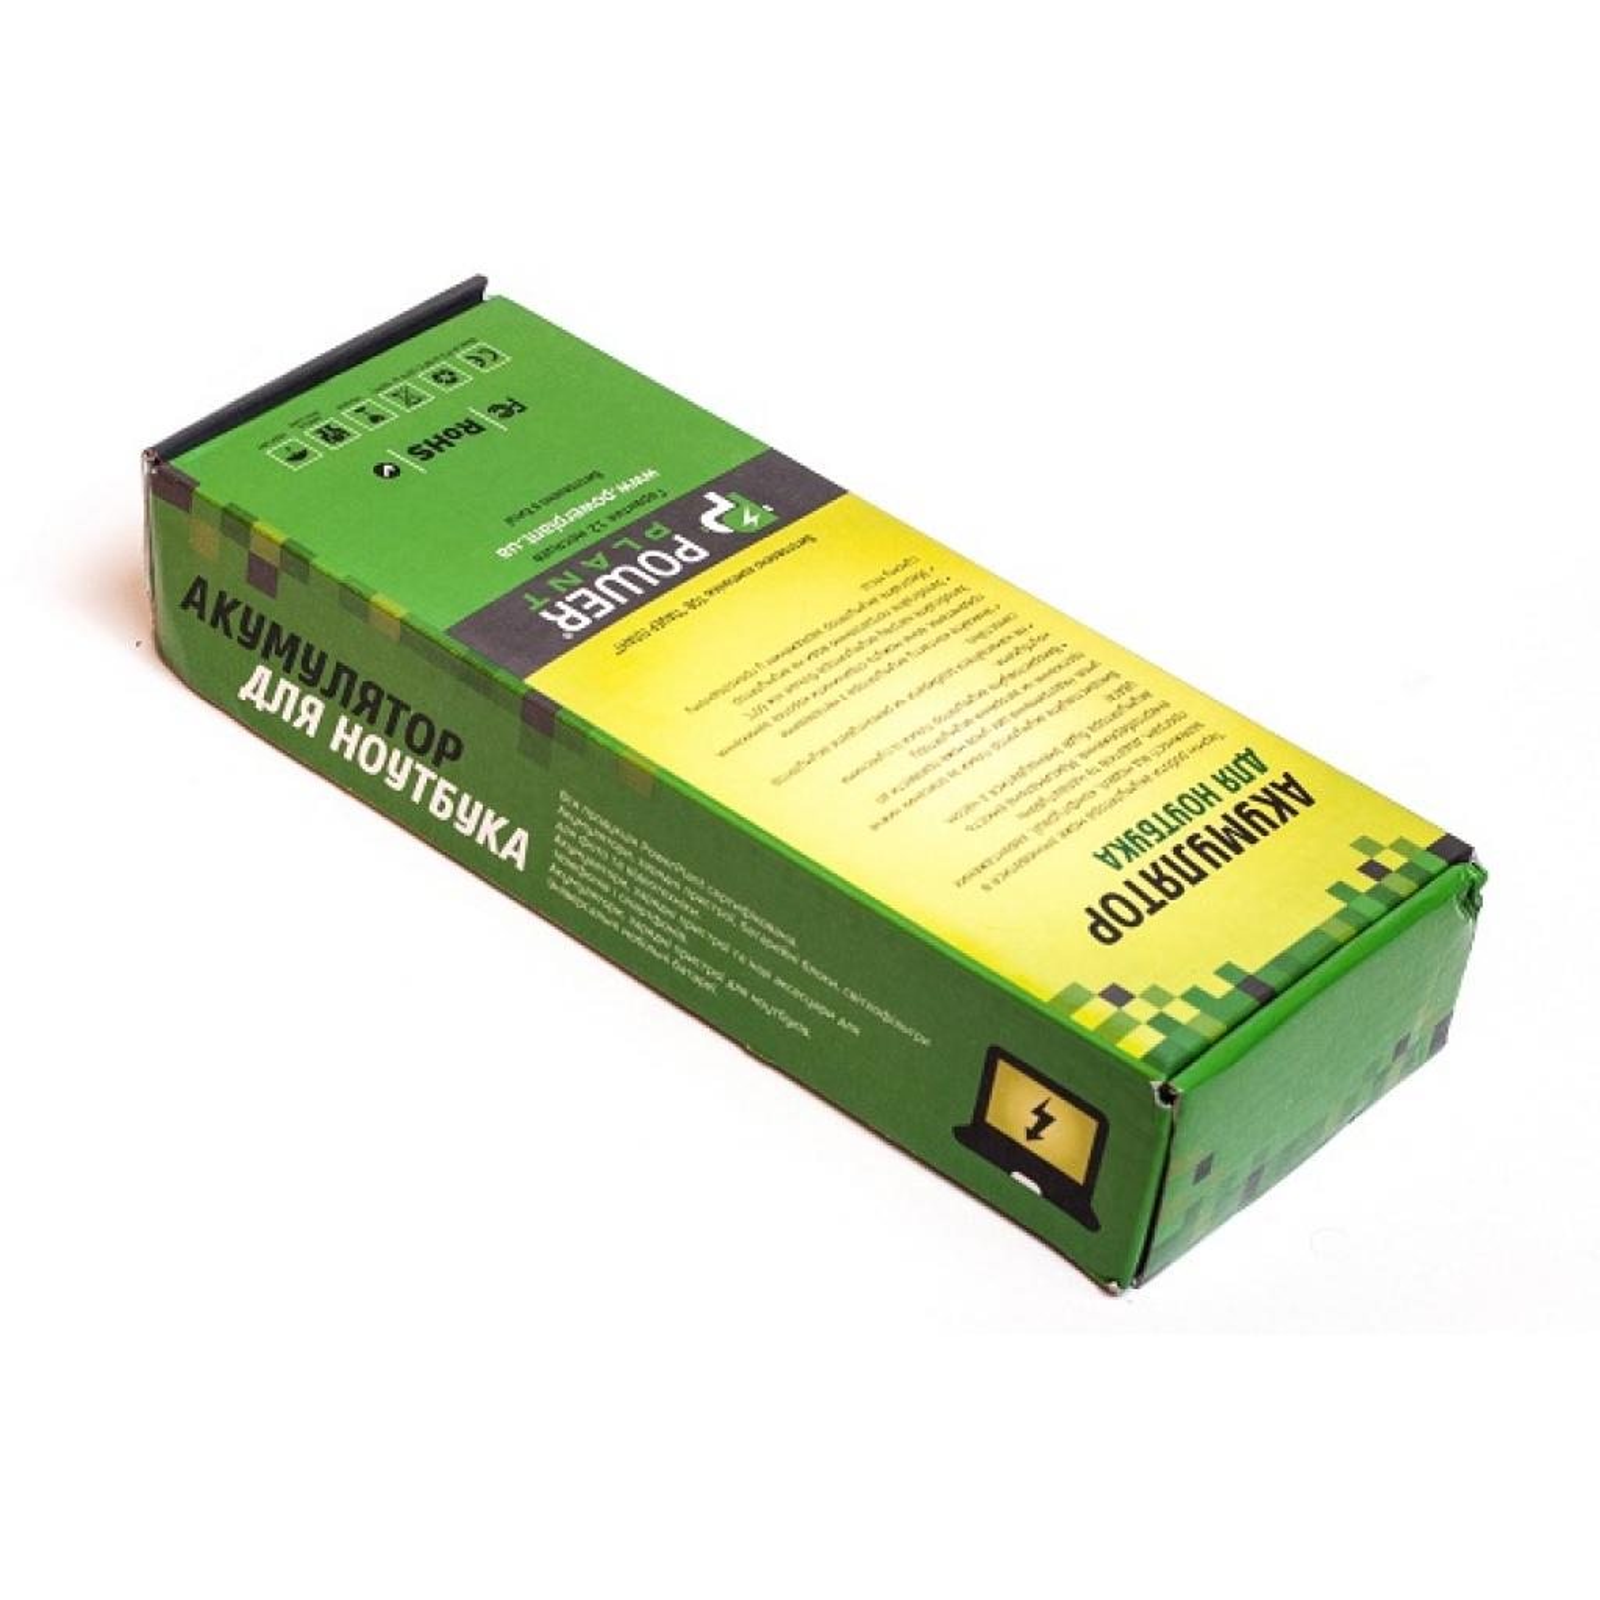 Аккумулятор для ноутбука DELL Latitude E5400 (KM742, DLE540LH) 11.1V 5200mAh PowerPlant (NB00000116) изображение 2